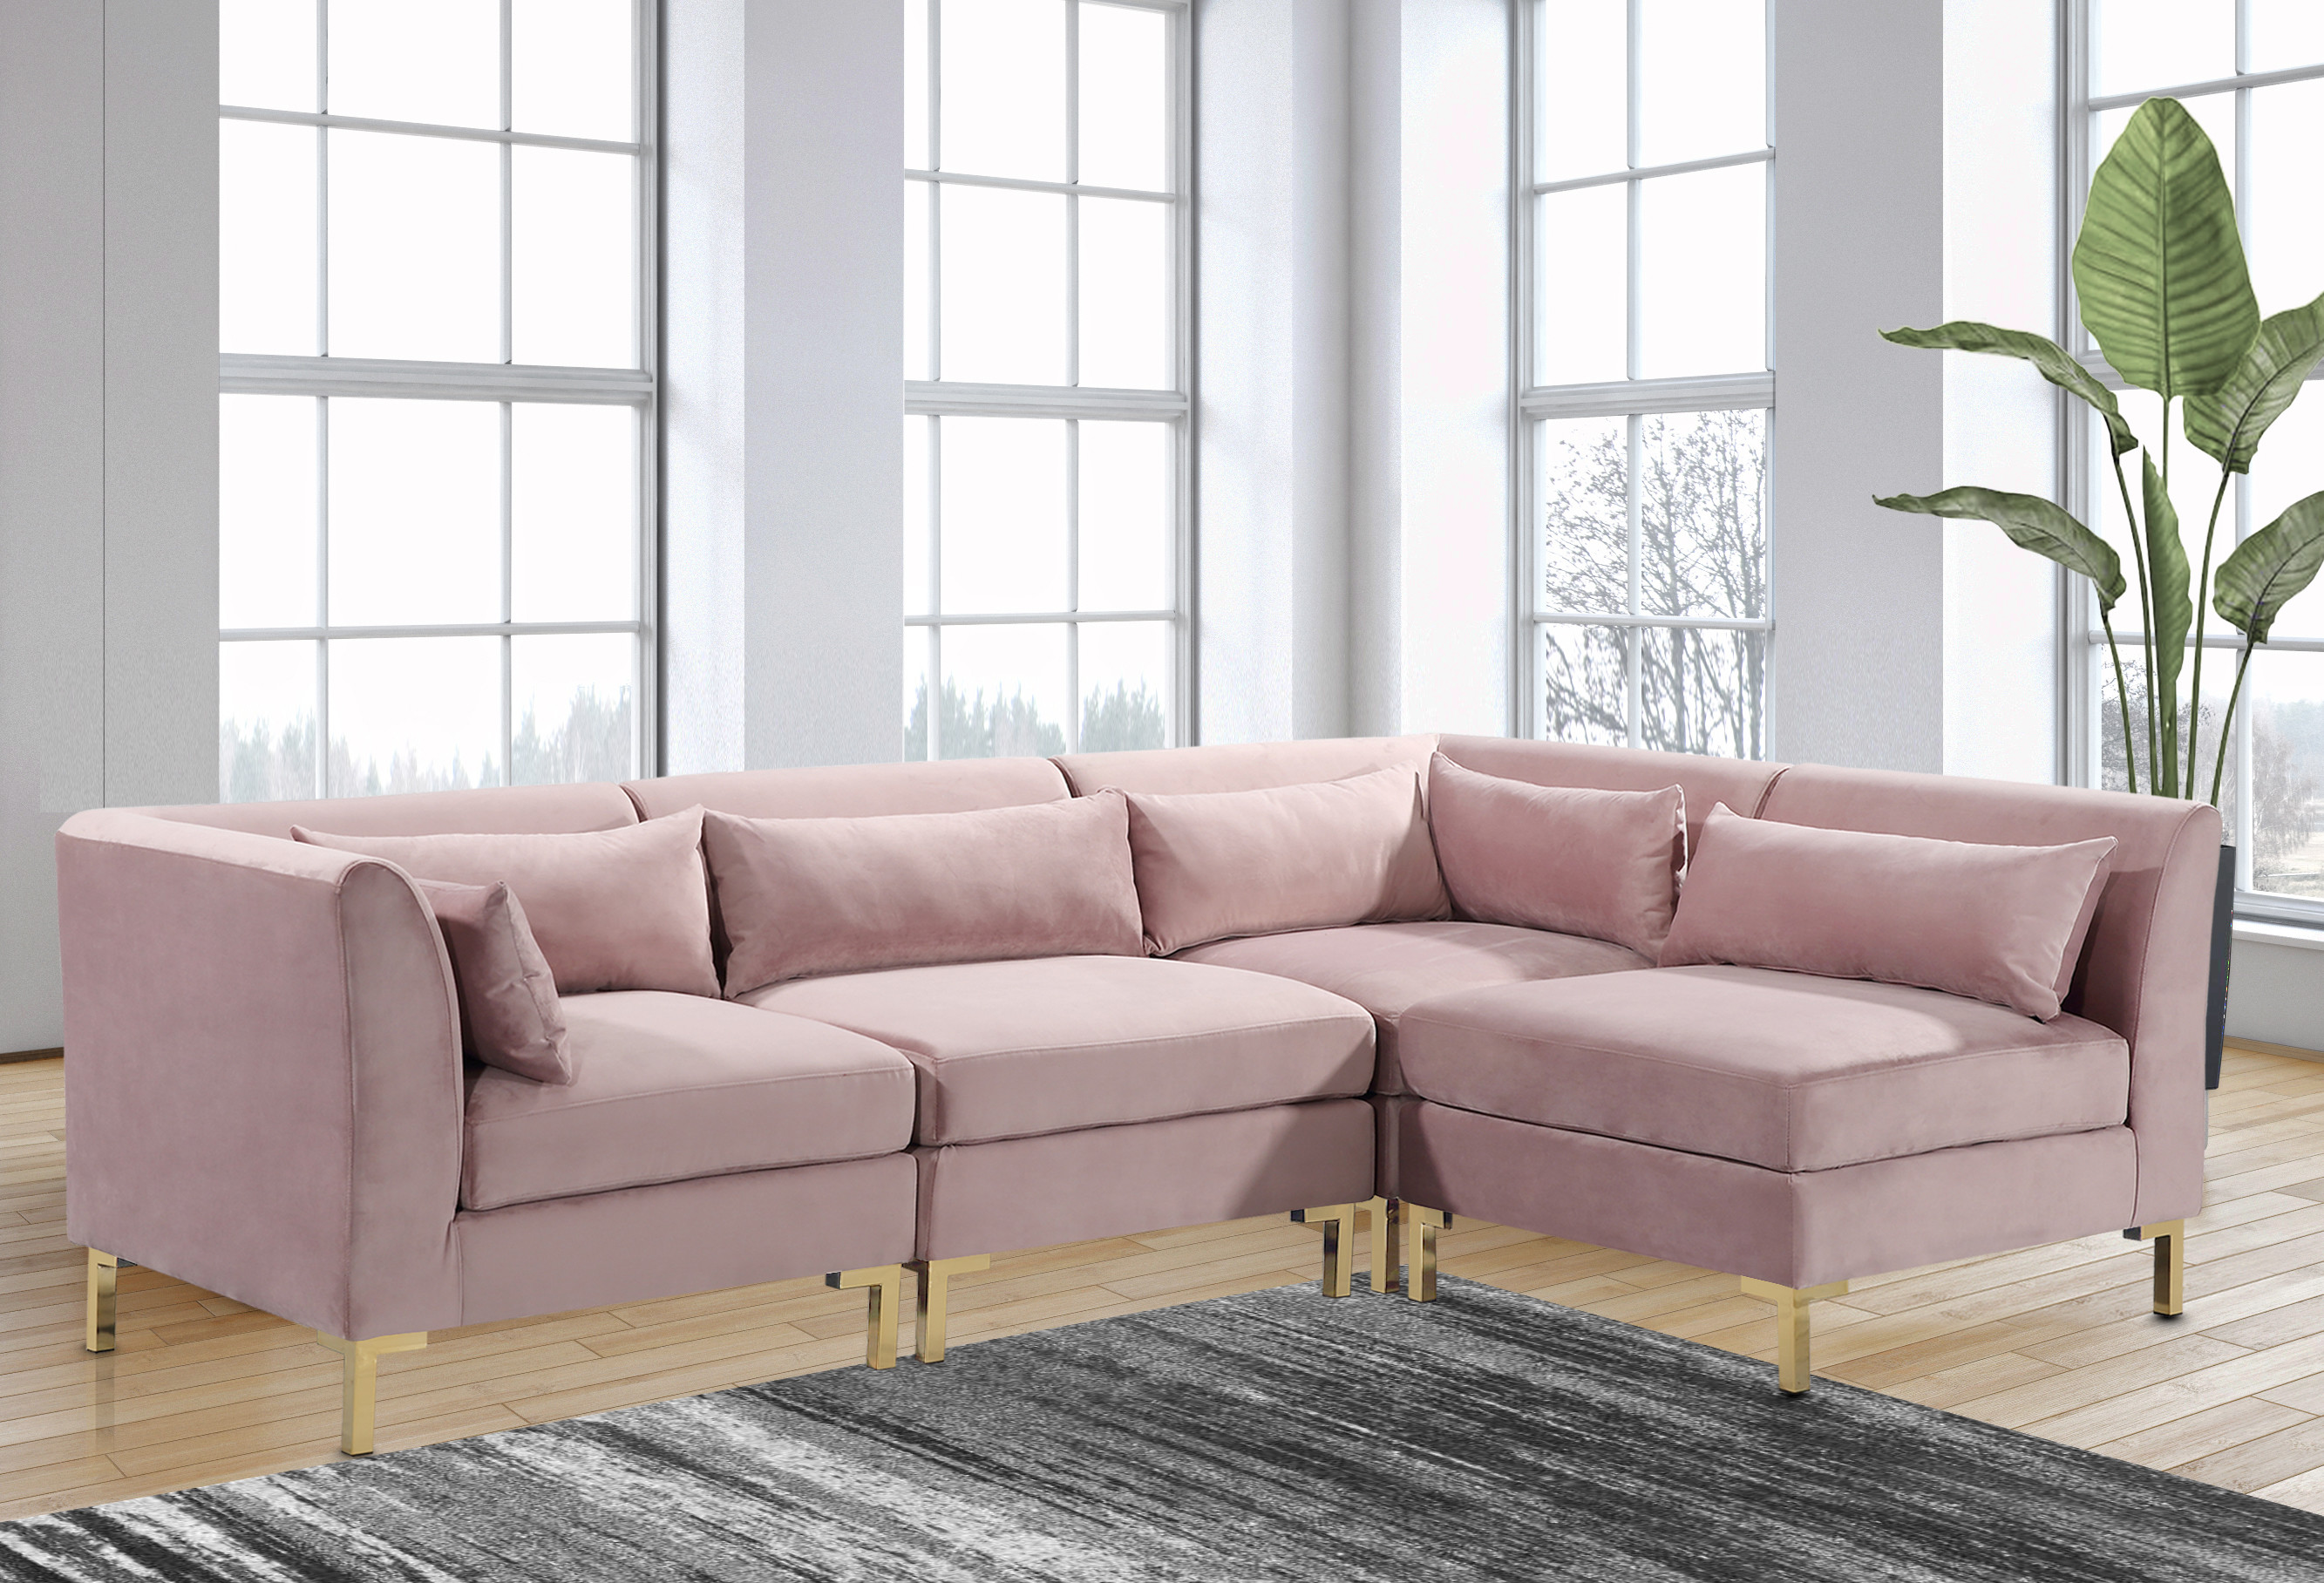 Chic Home Guison Modular Chaise Sectional Sofa With 6 Throw Pillows Walmart Com Walmart Com